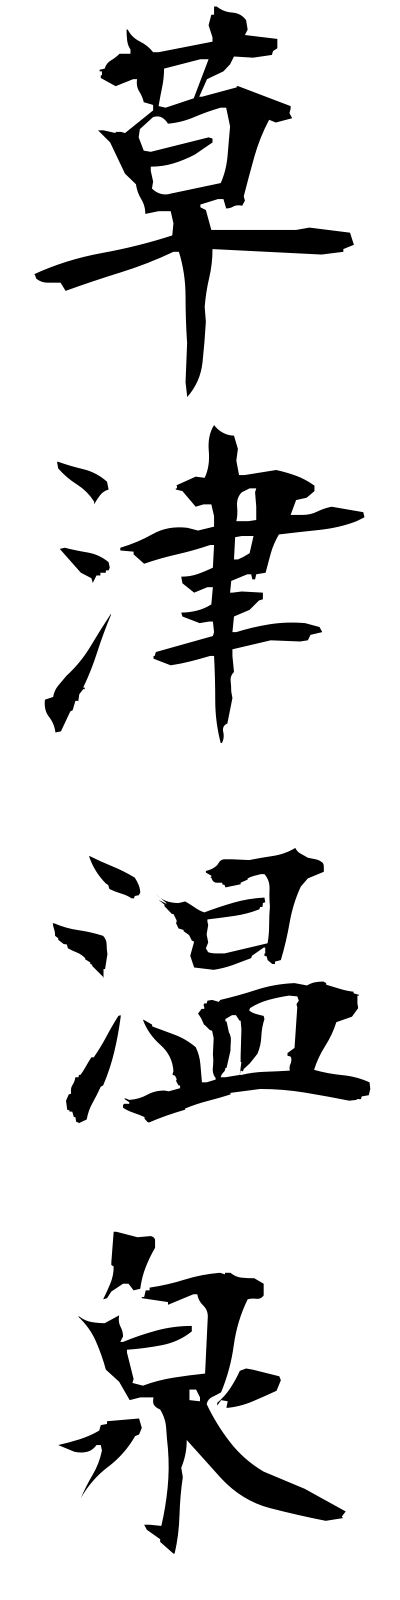 k30060 草津温泉 くさつおんせん – 四字熟語